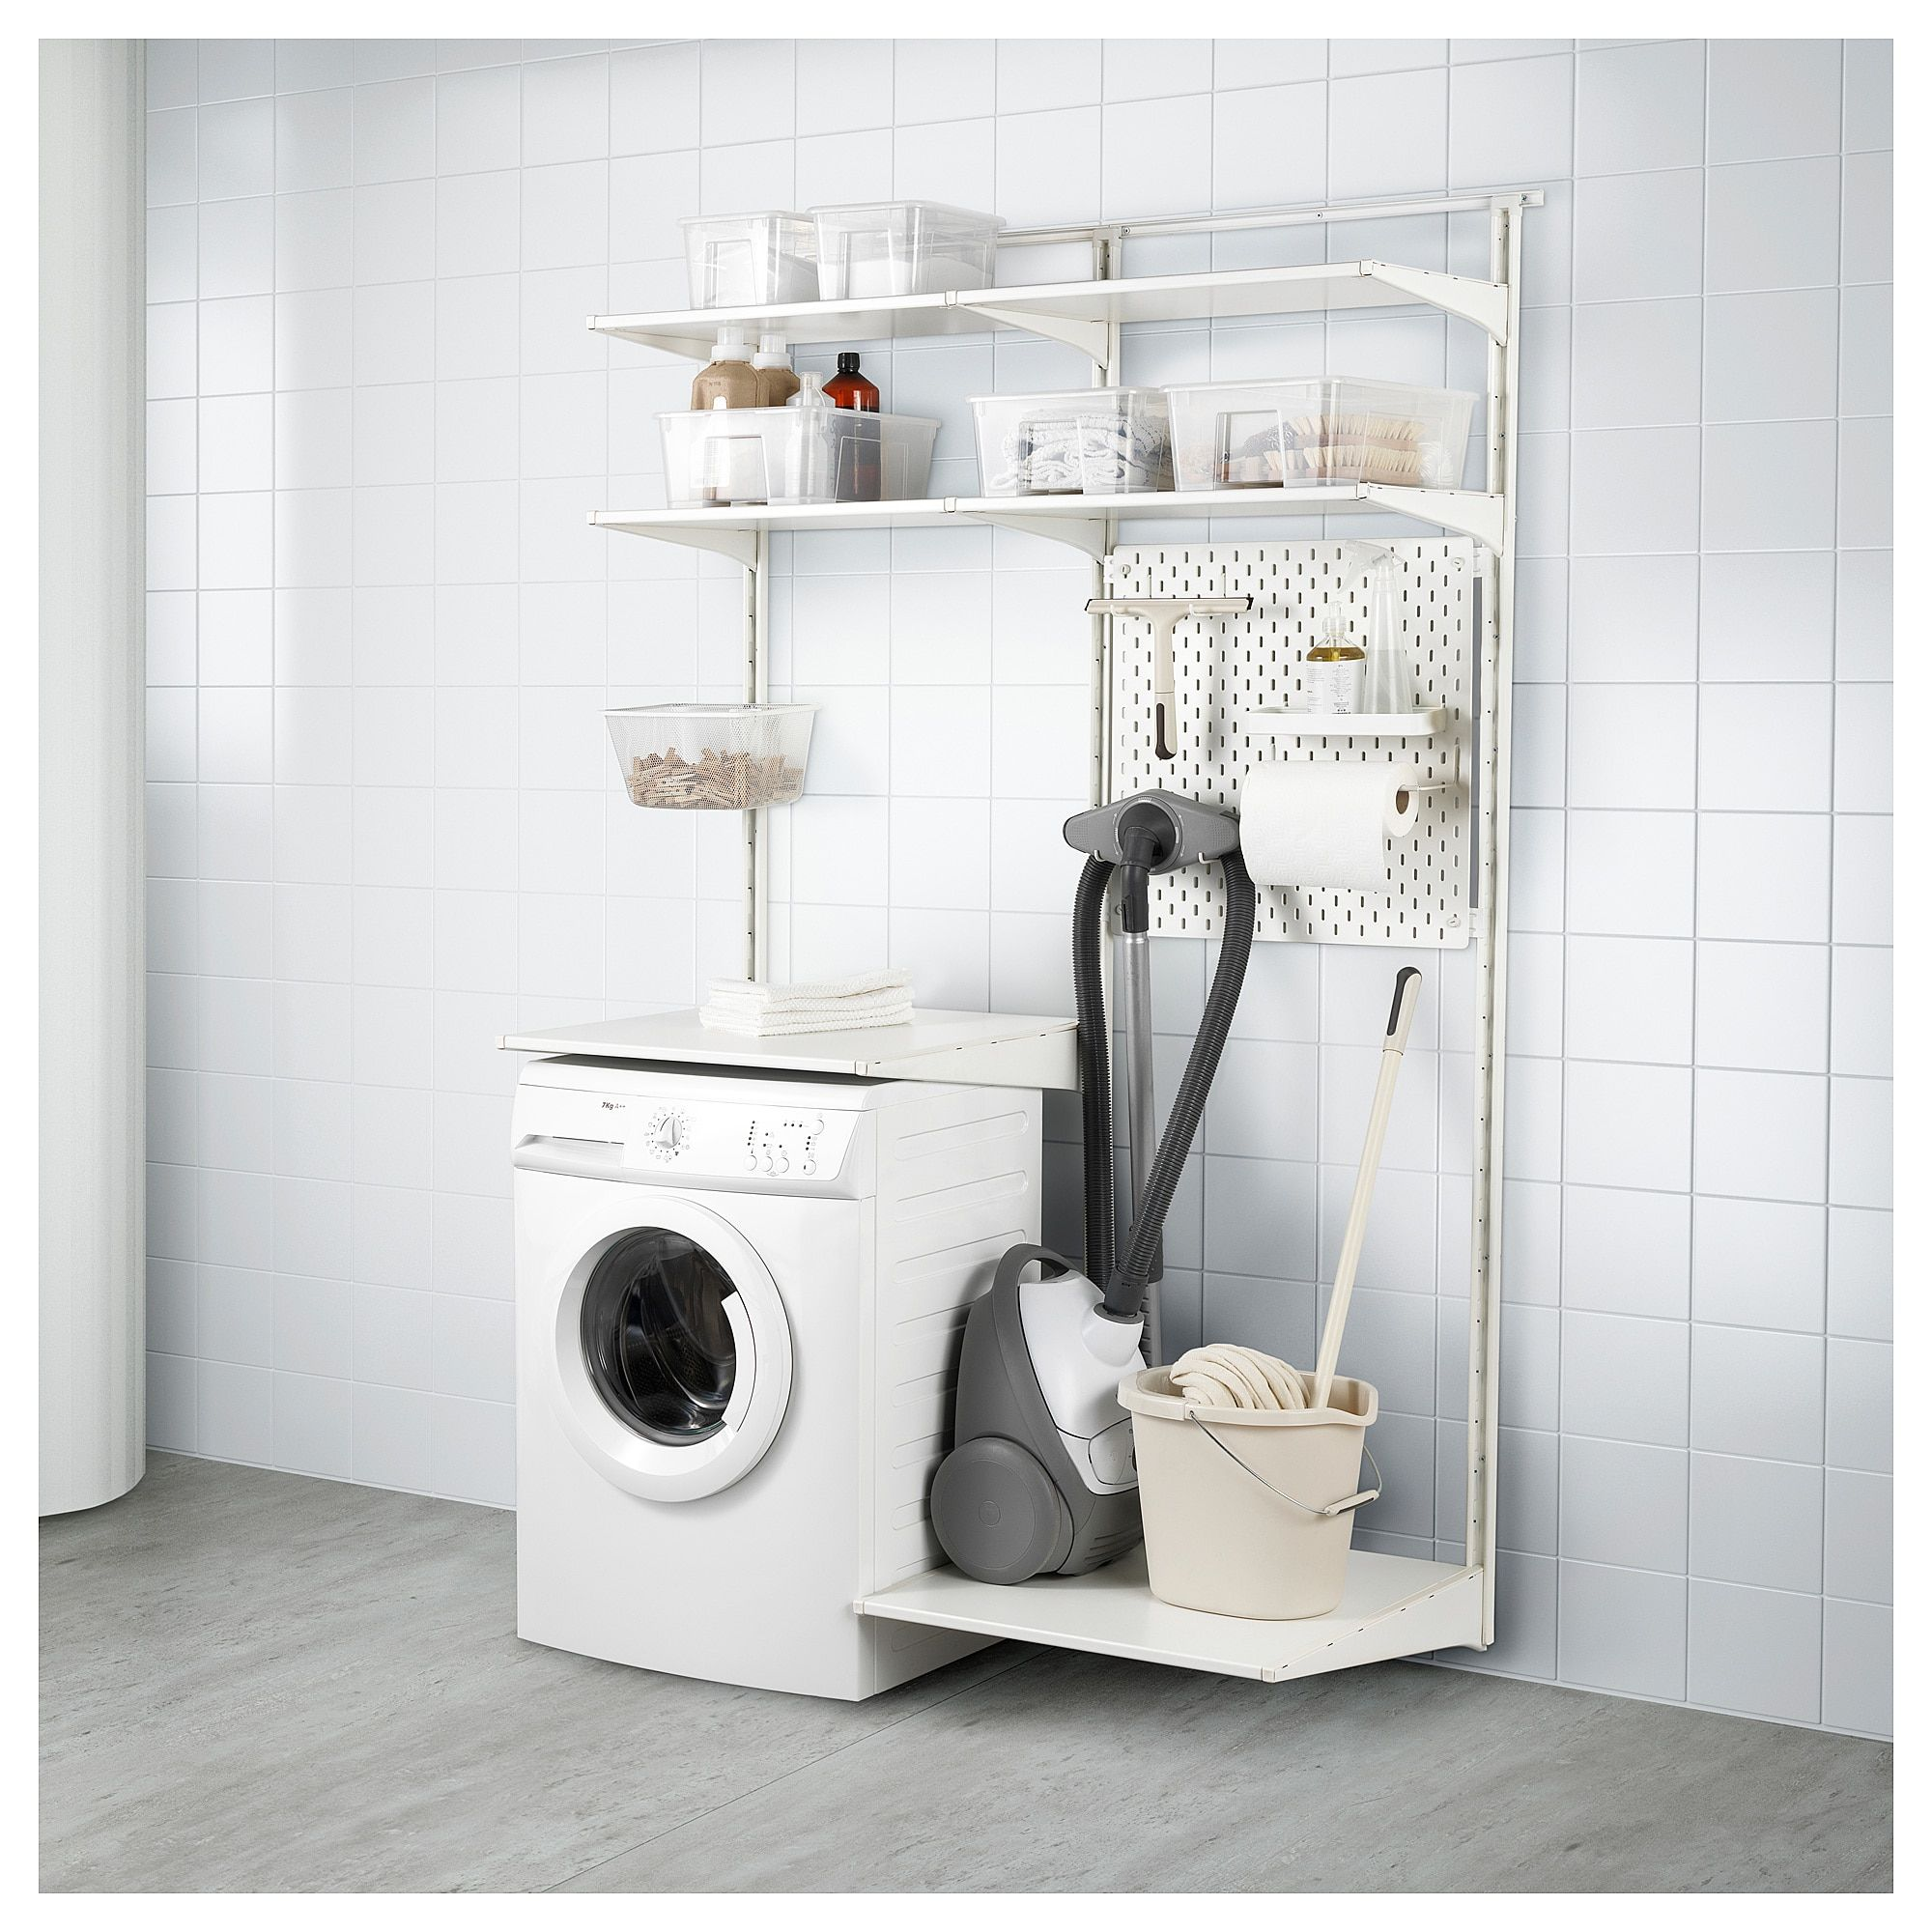 US Furniture and Home Furnishings Ikea algot, Ikea